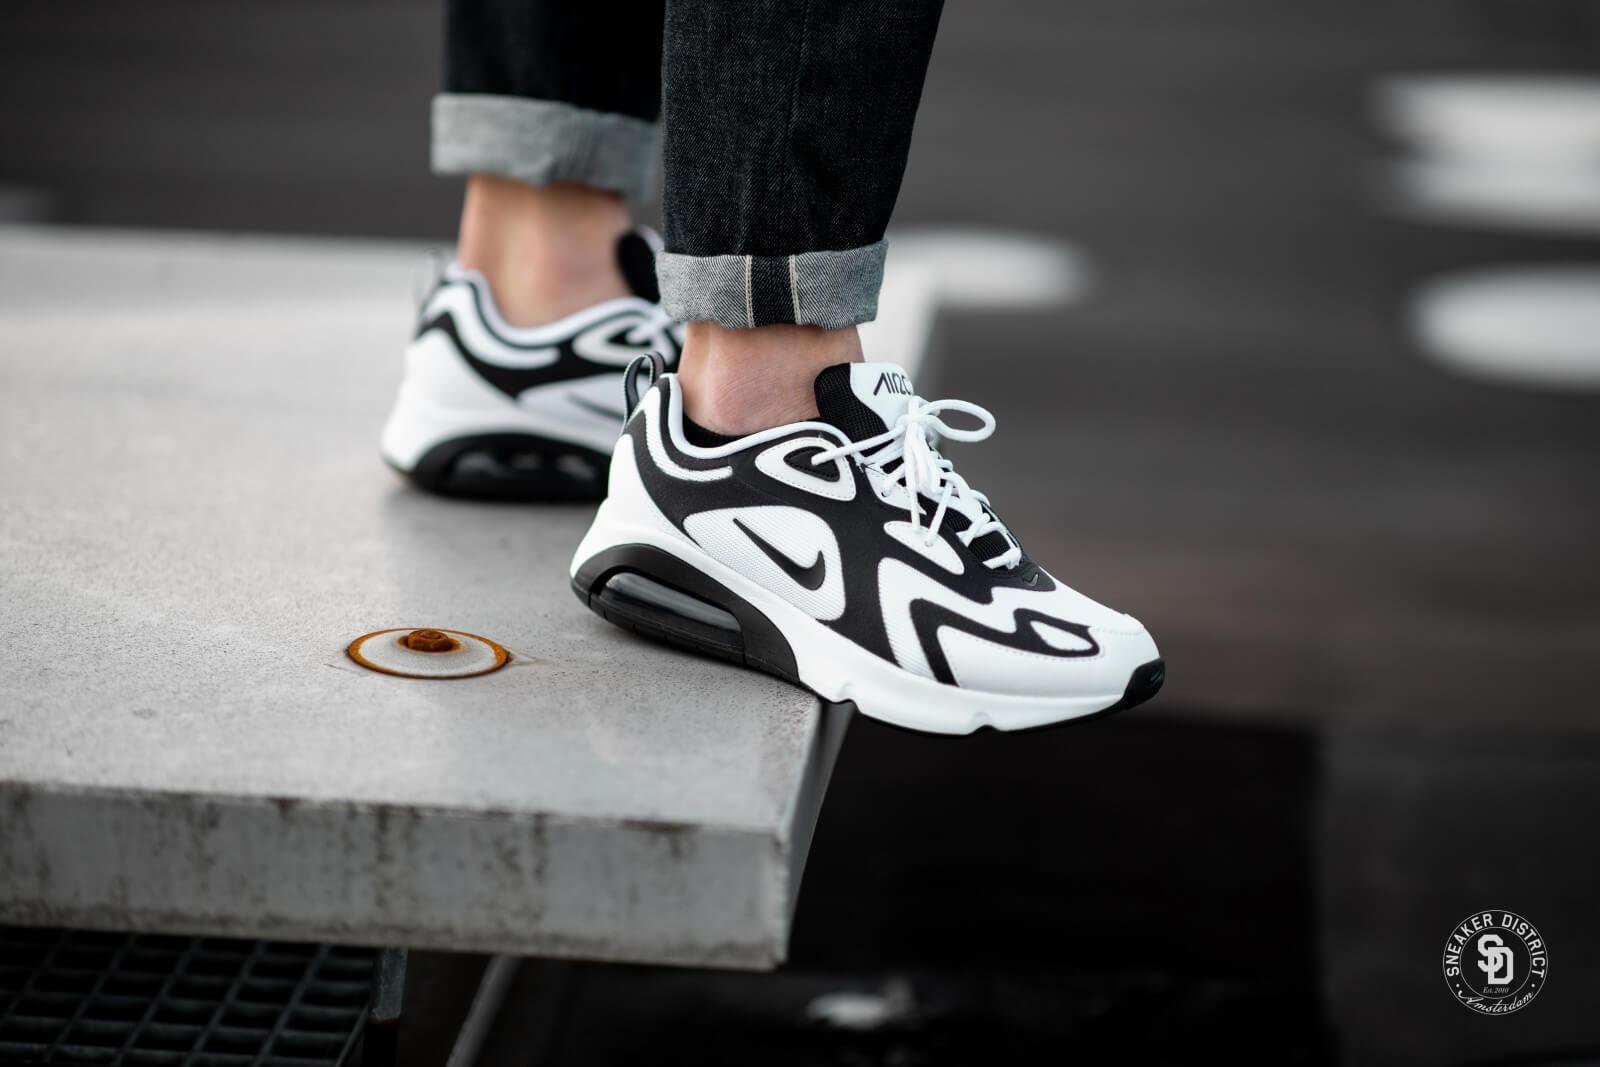 Nike Air Max 200 White/Black-Anthracite - AQ2568-104